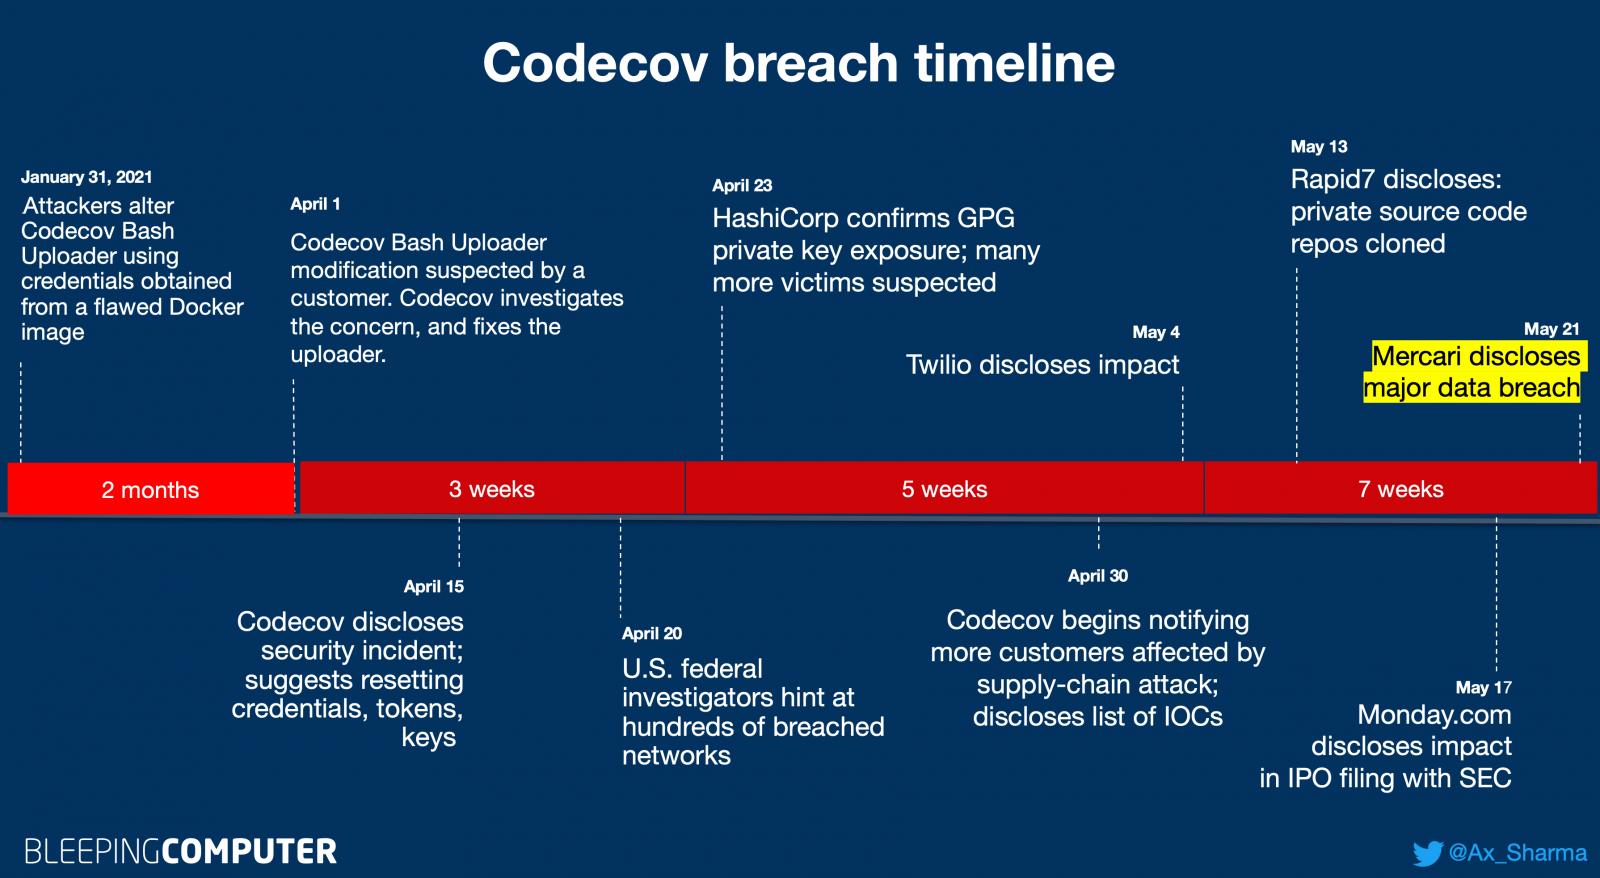 Codecov timeline